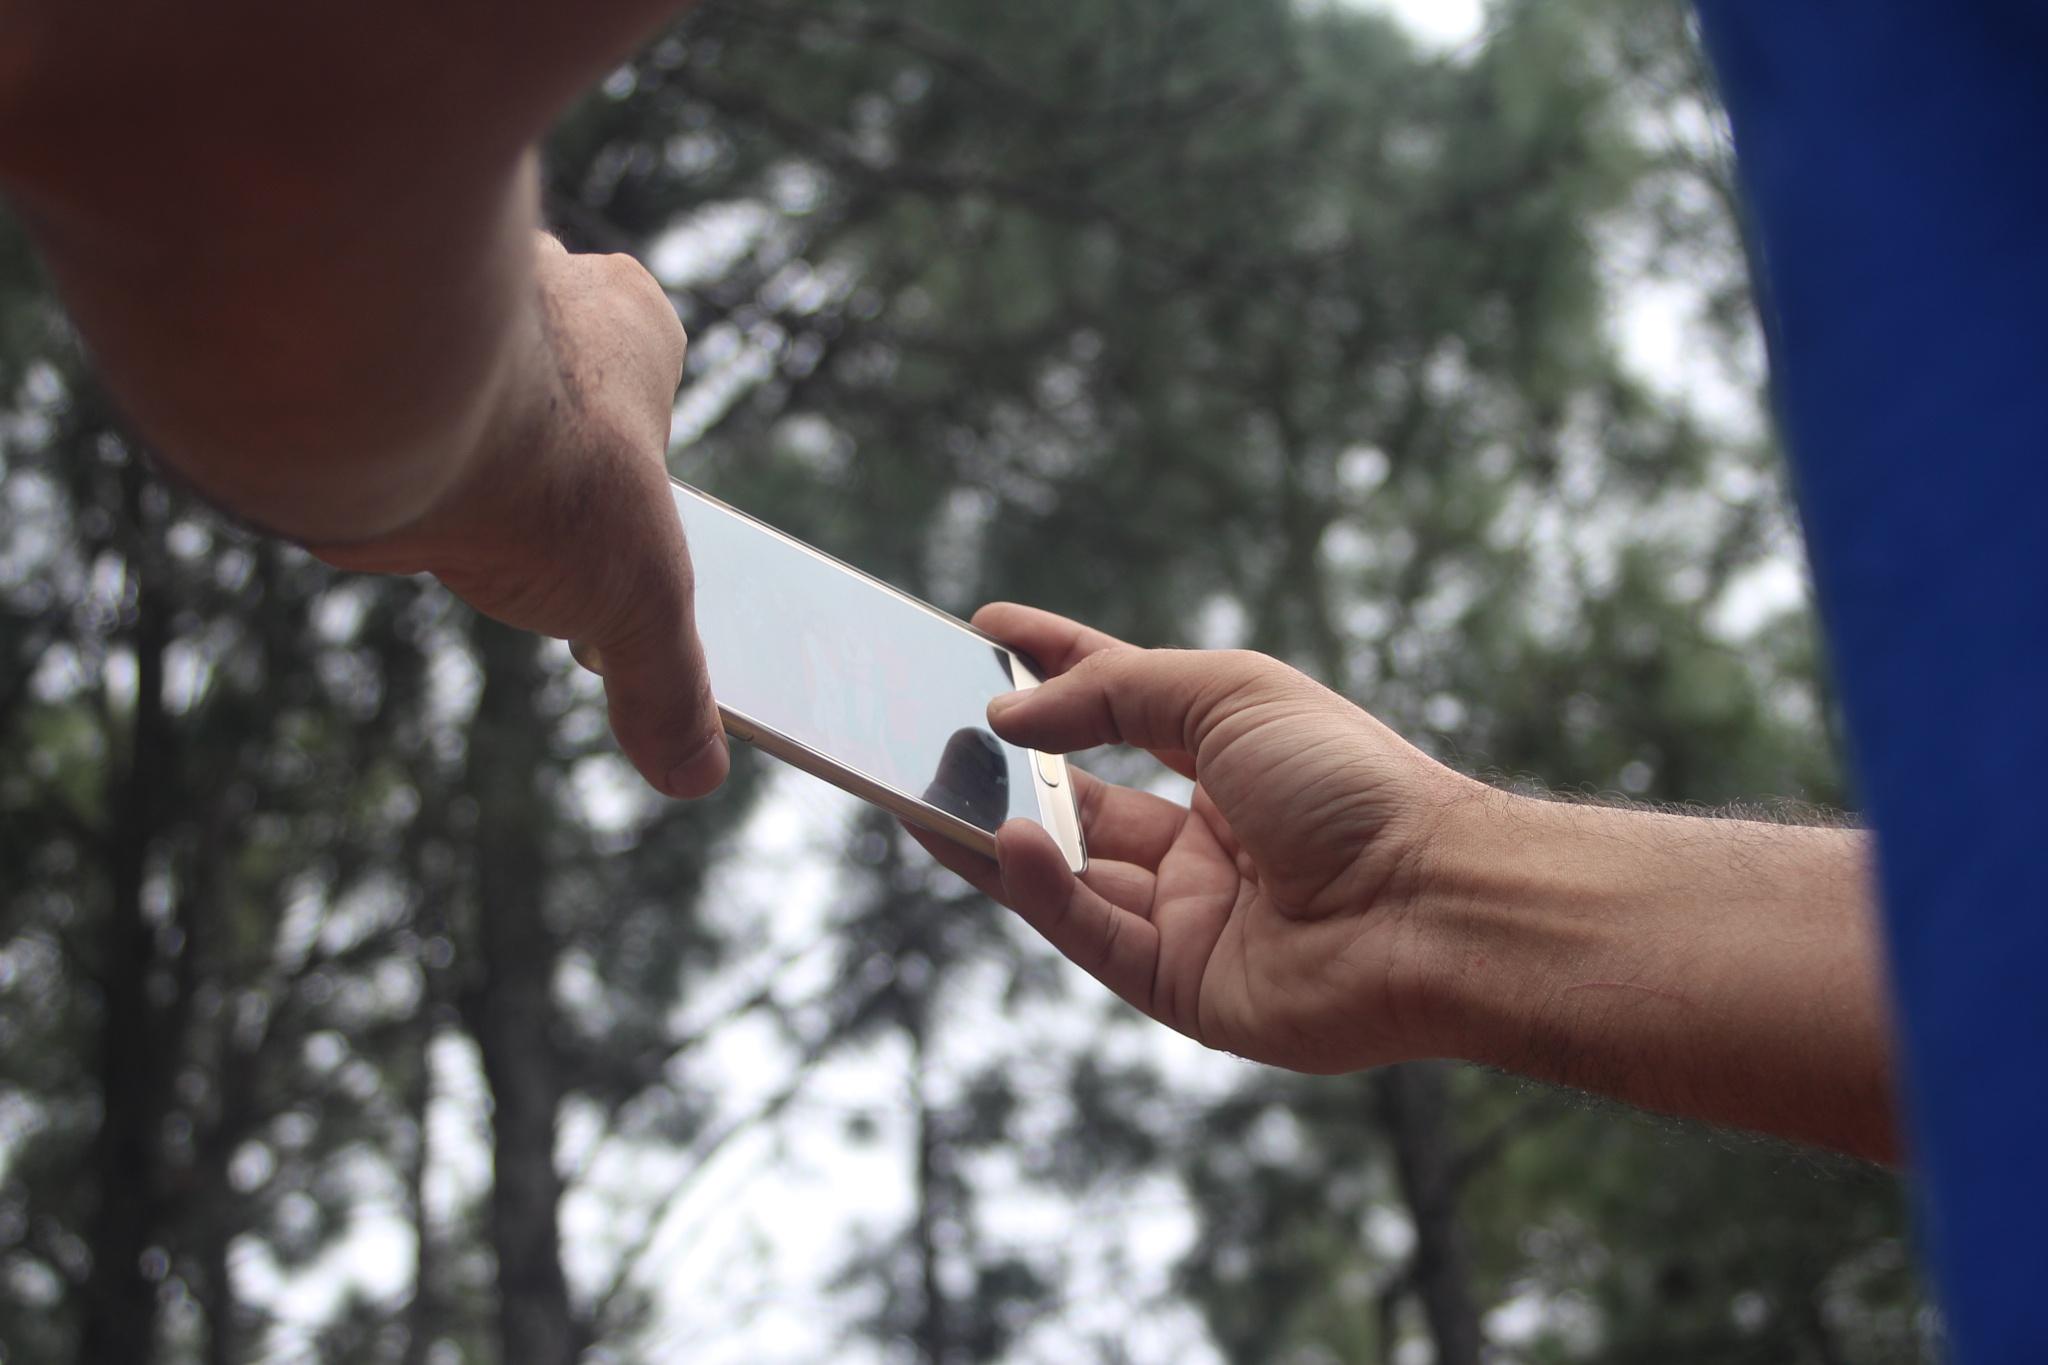 Samsung on hands by Waleed Bin Abdul Malik